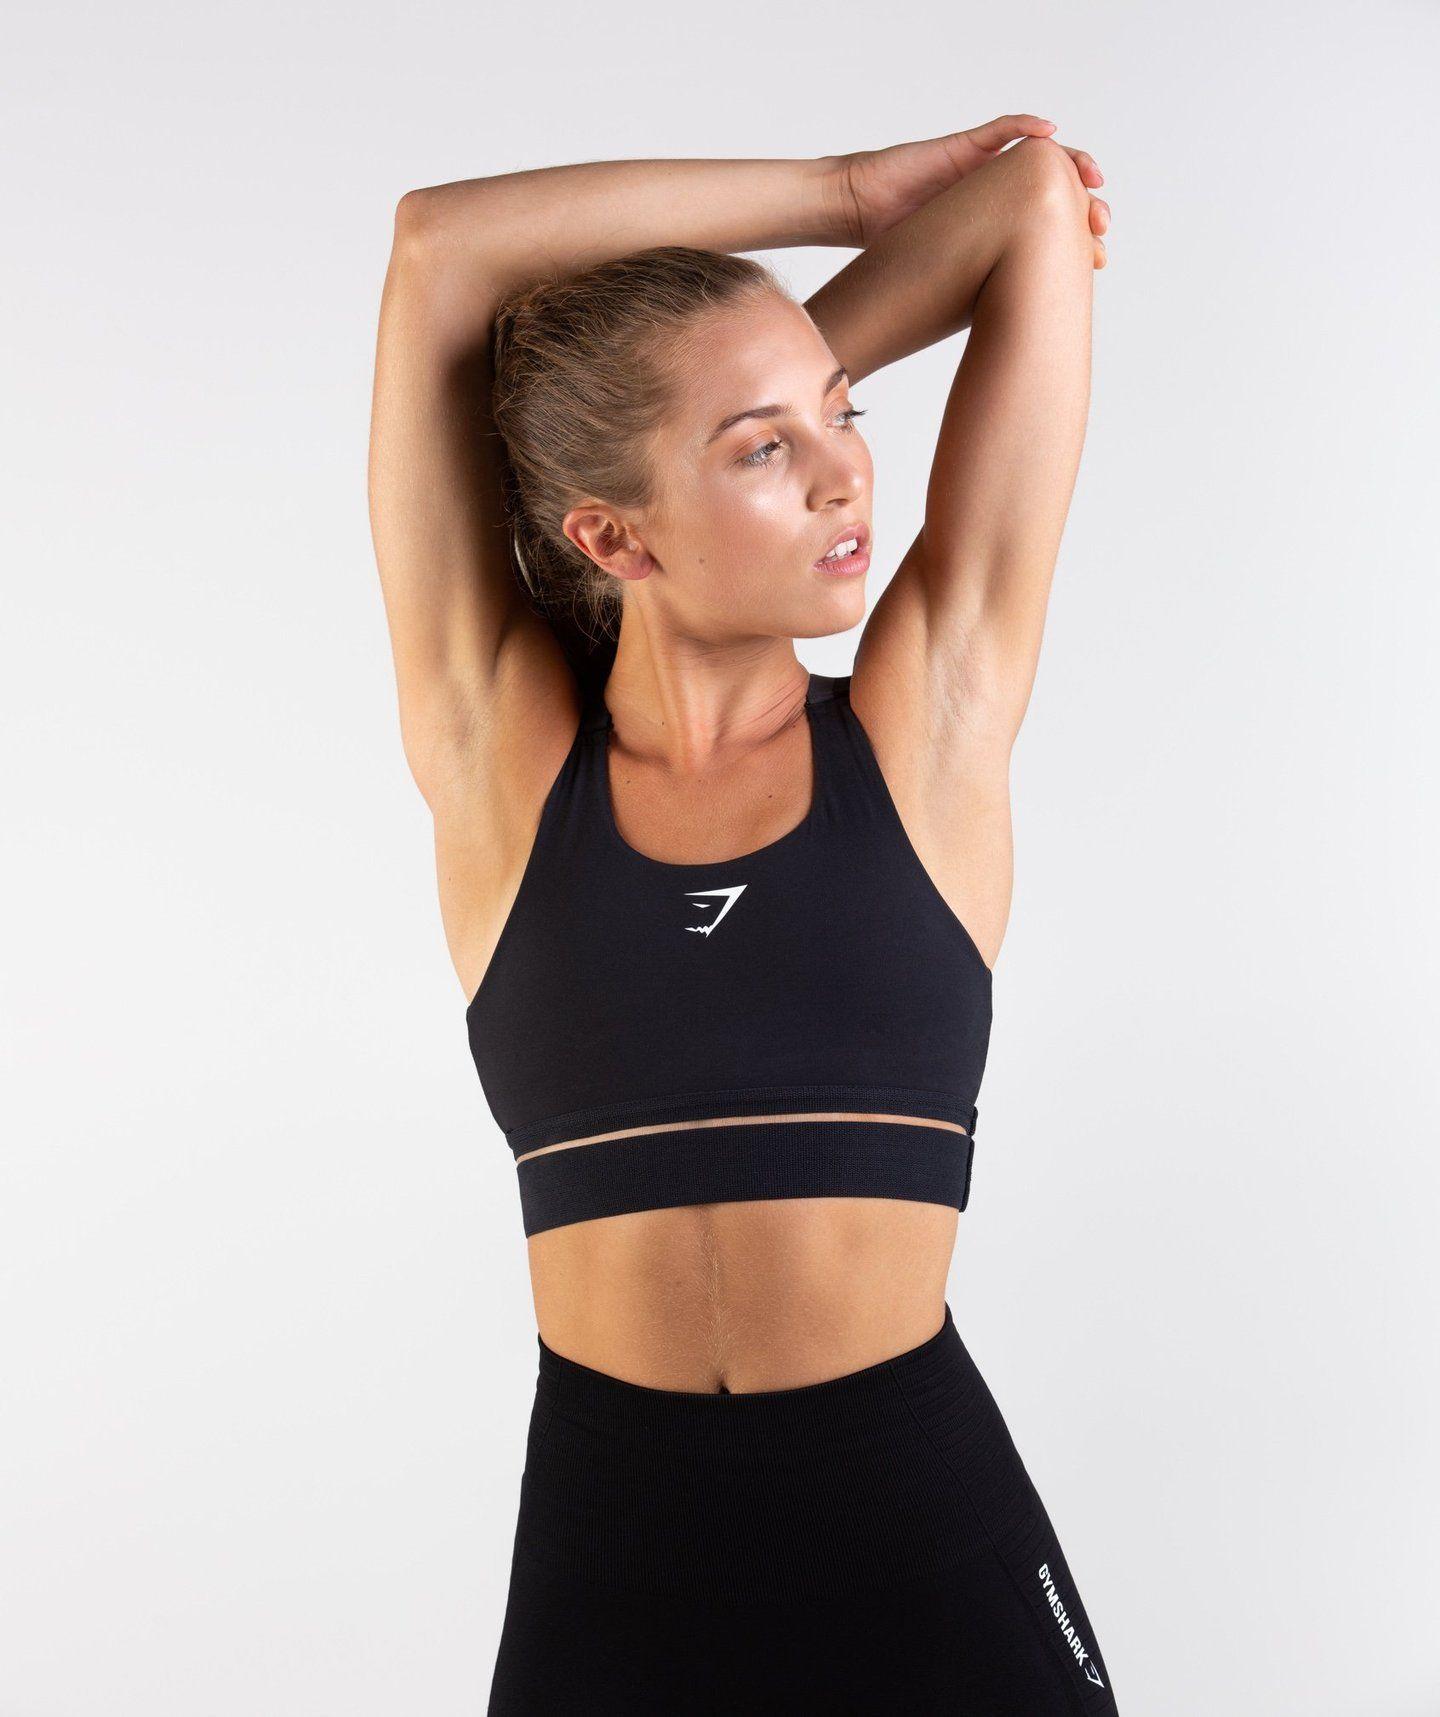 1a4bb84a22 Gymshark Embody Sports Bra - Black in 2019